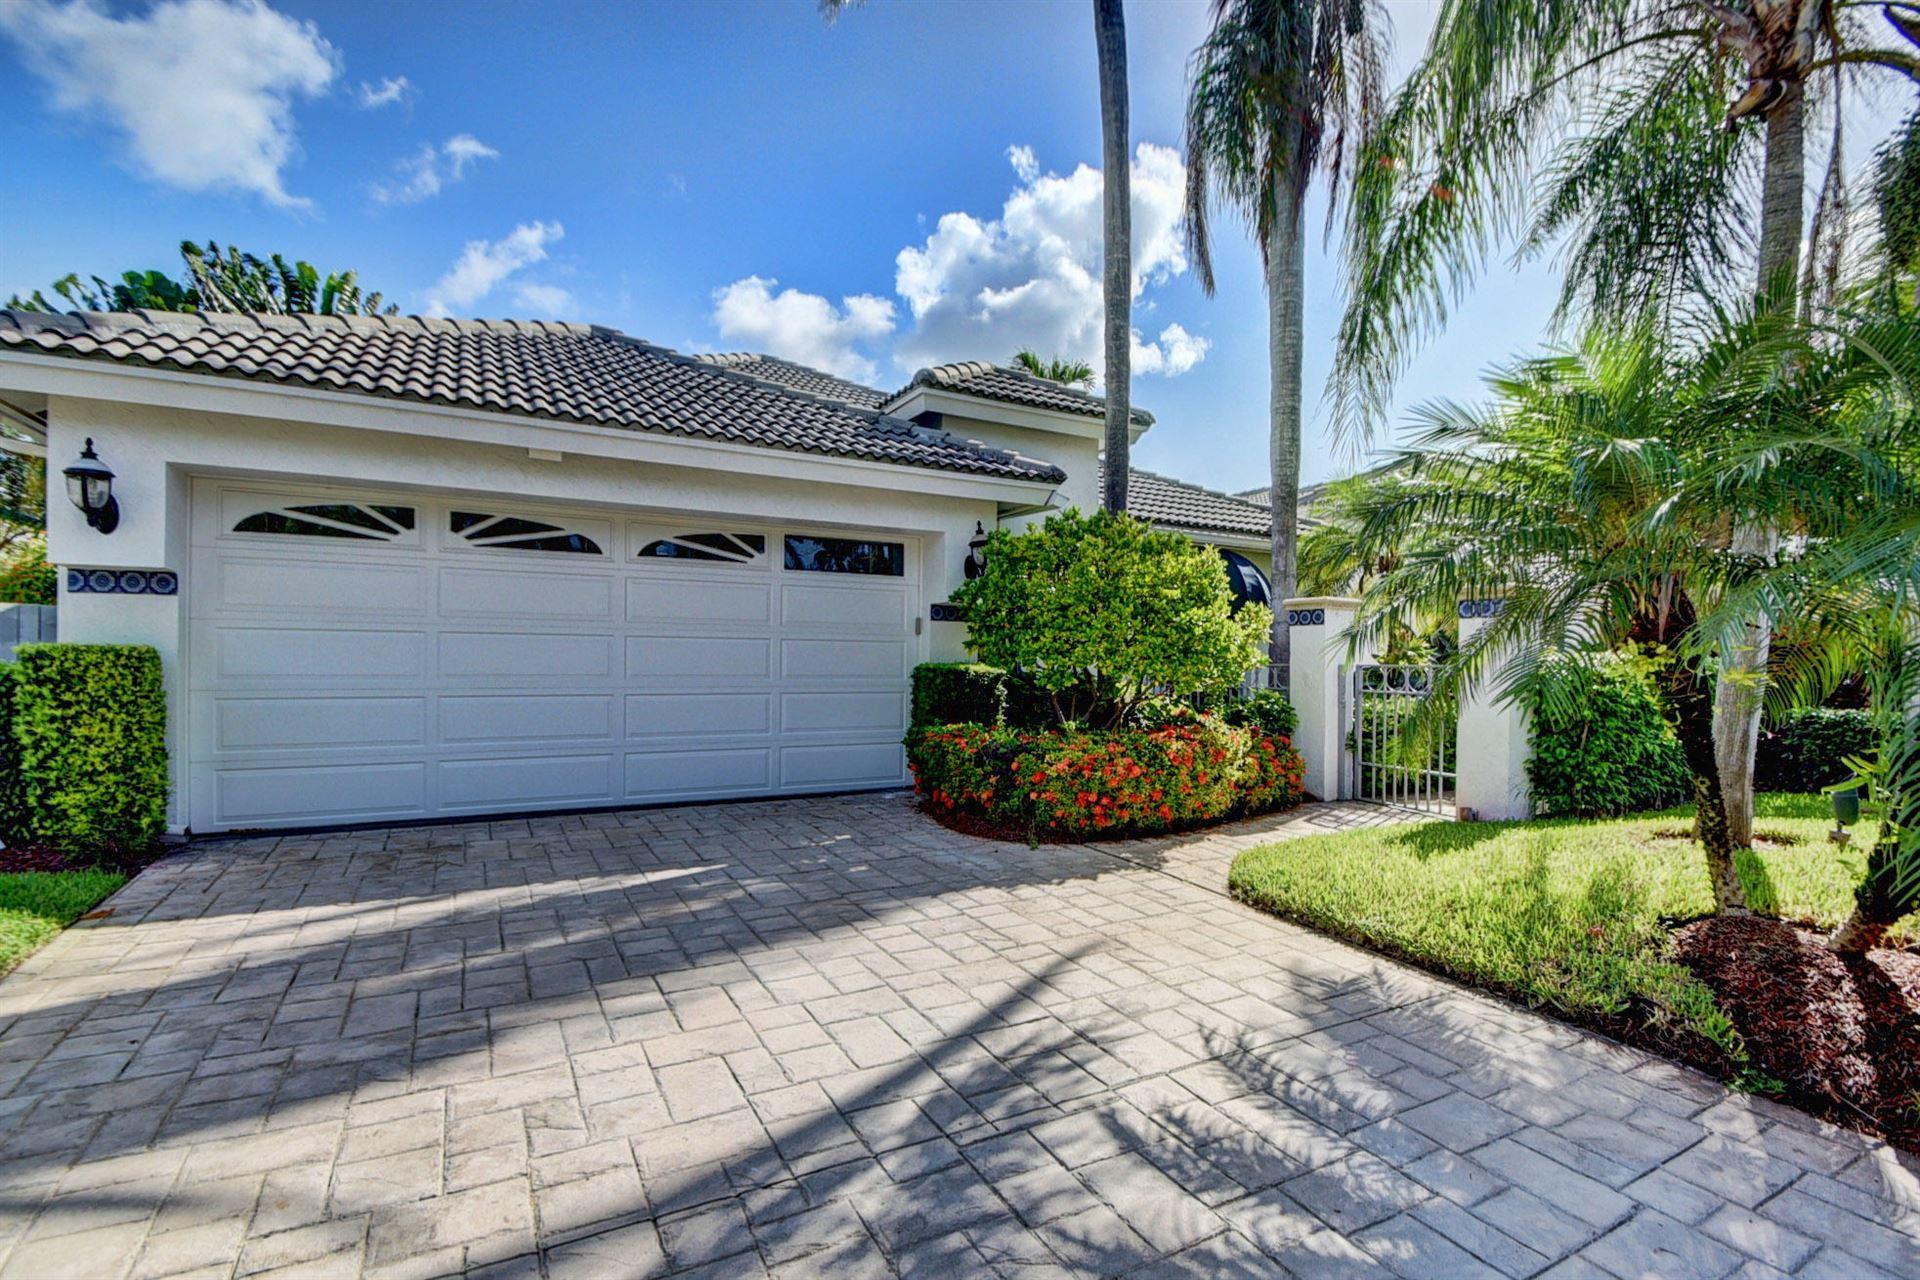 2140 NW 60th Circle, Boca Raton, FL 33496 - #: RX-10626089